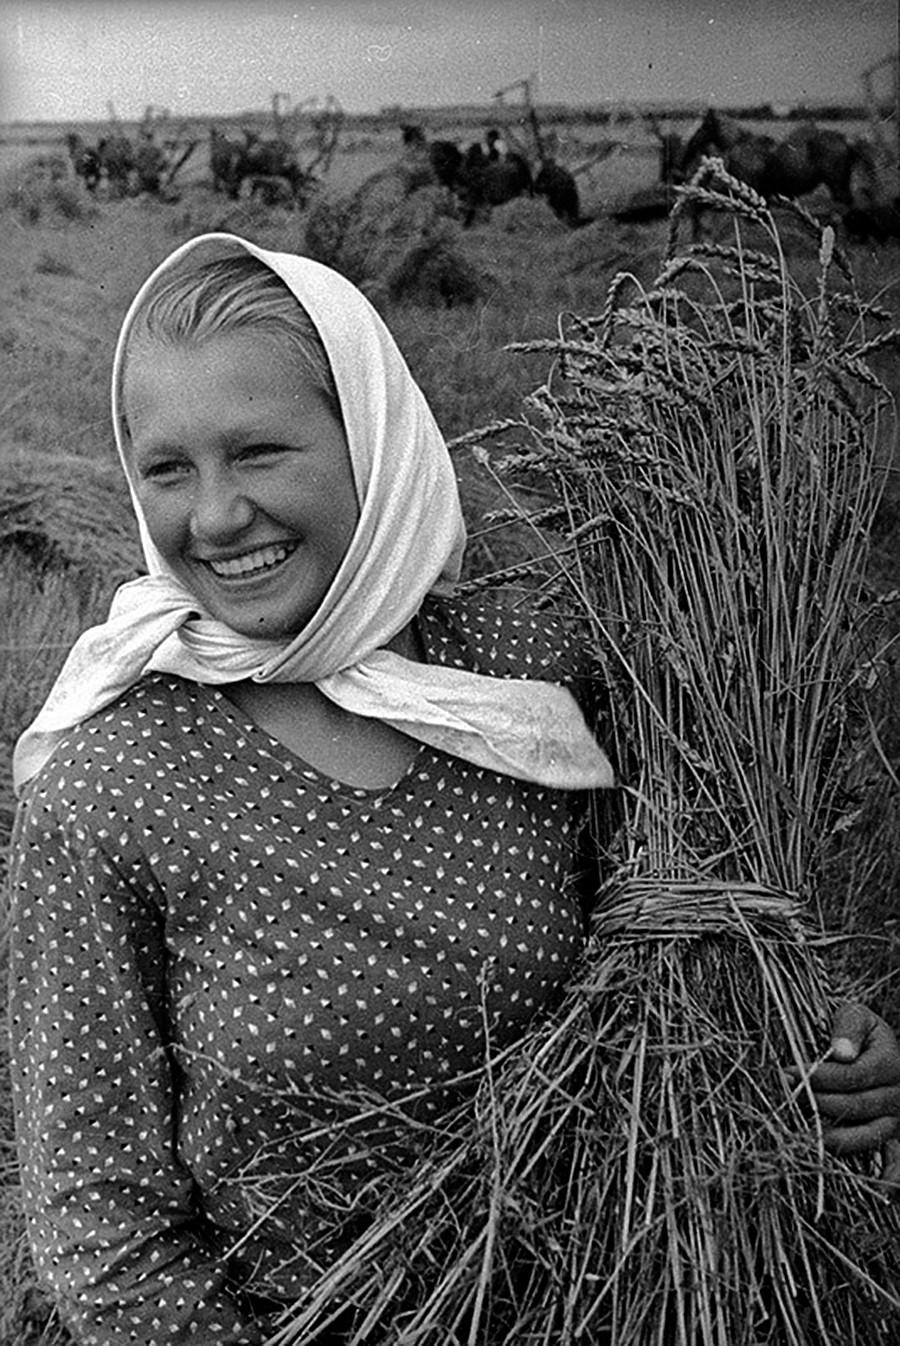 Frau mit Weizengarbe